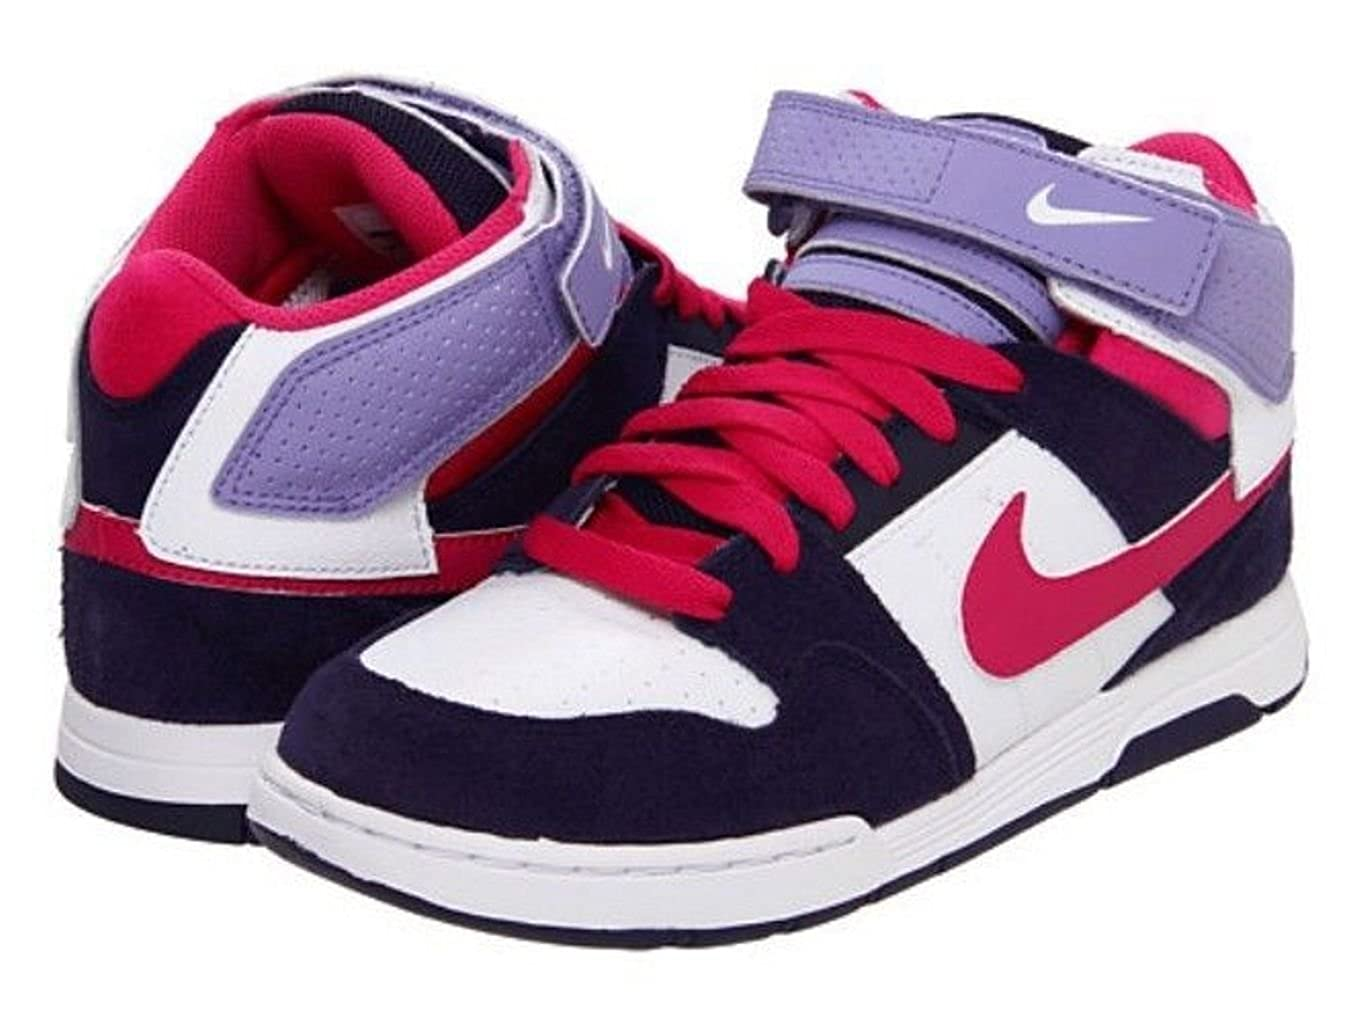 grand choix de 54f39 7764b Nike 6.0 Mogan Mid 2 Jr G Girl Athletic Shoes Size 6